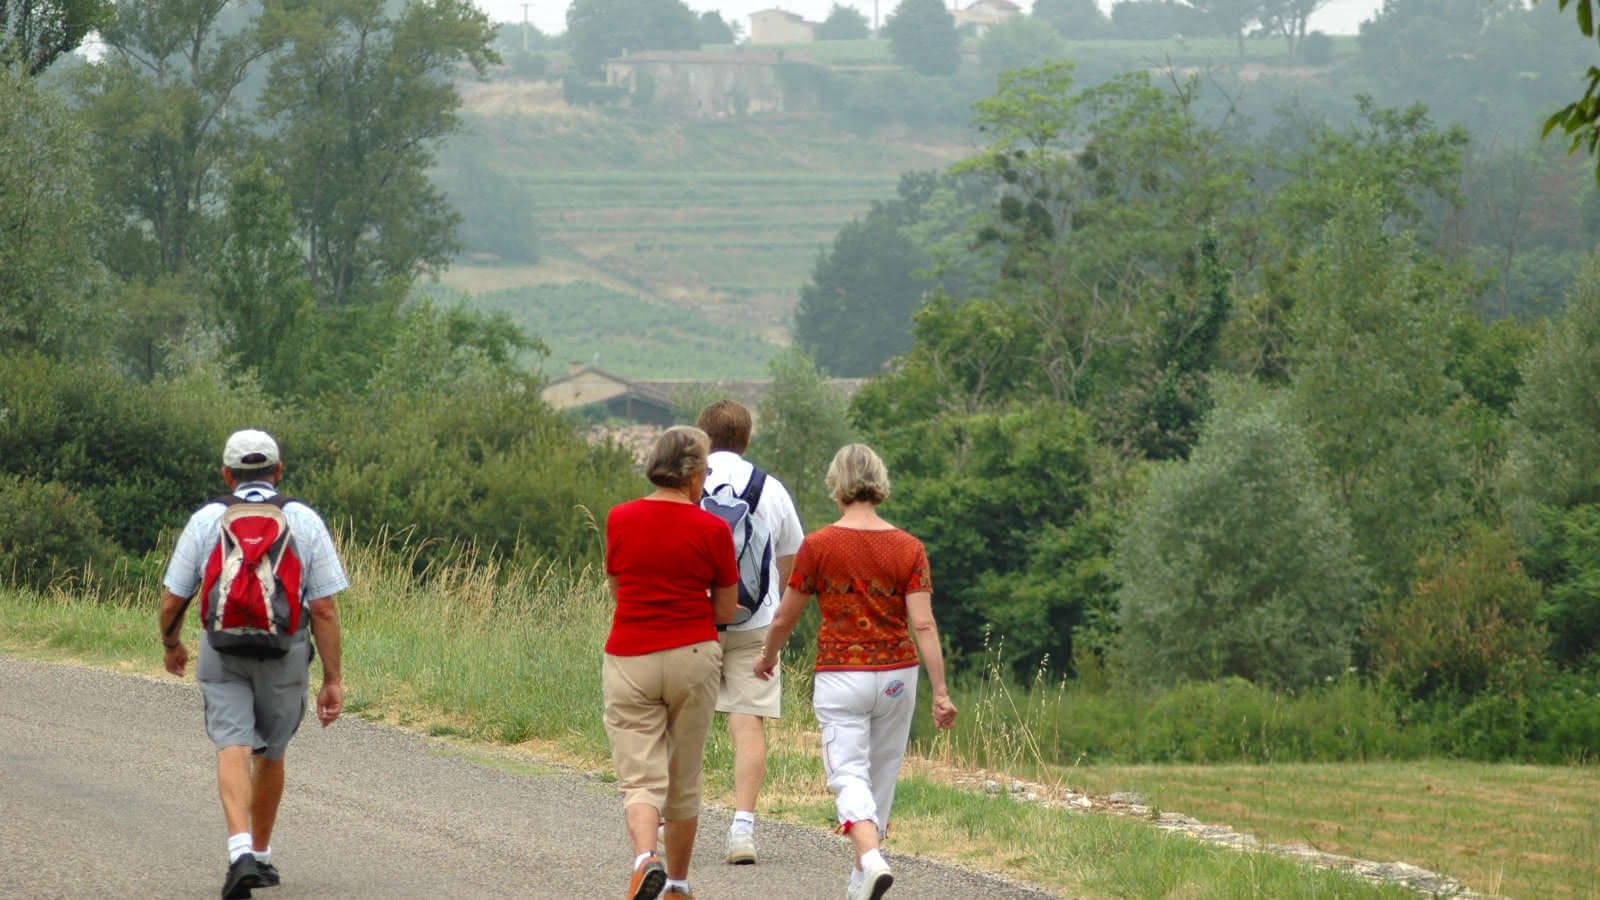 PROMENADES_OFF DE TOURISME_HD (1)